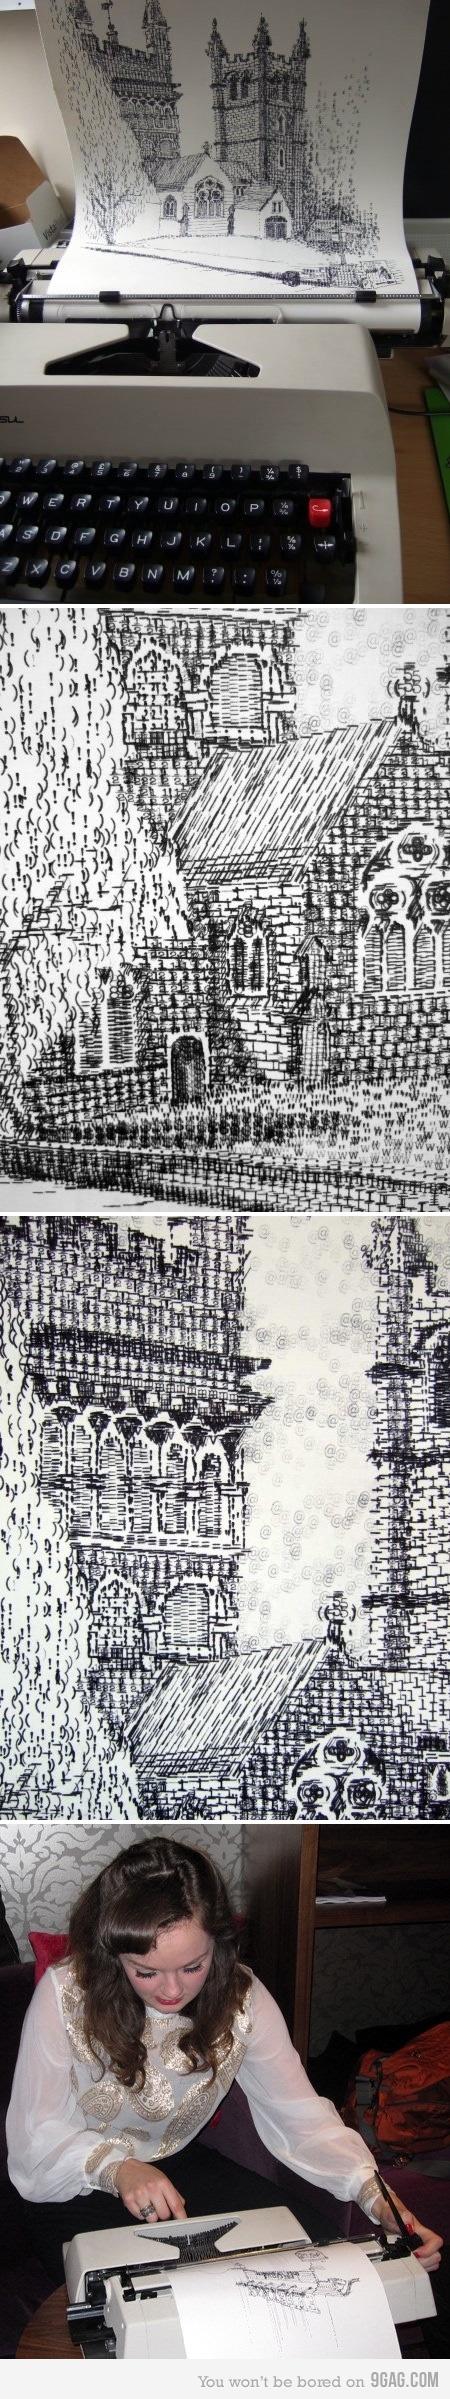 Kiera Rathbone's typewriter art. Fantastic!